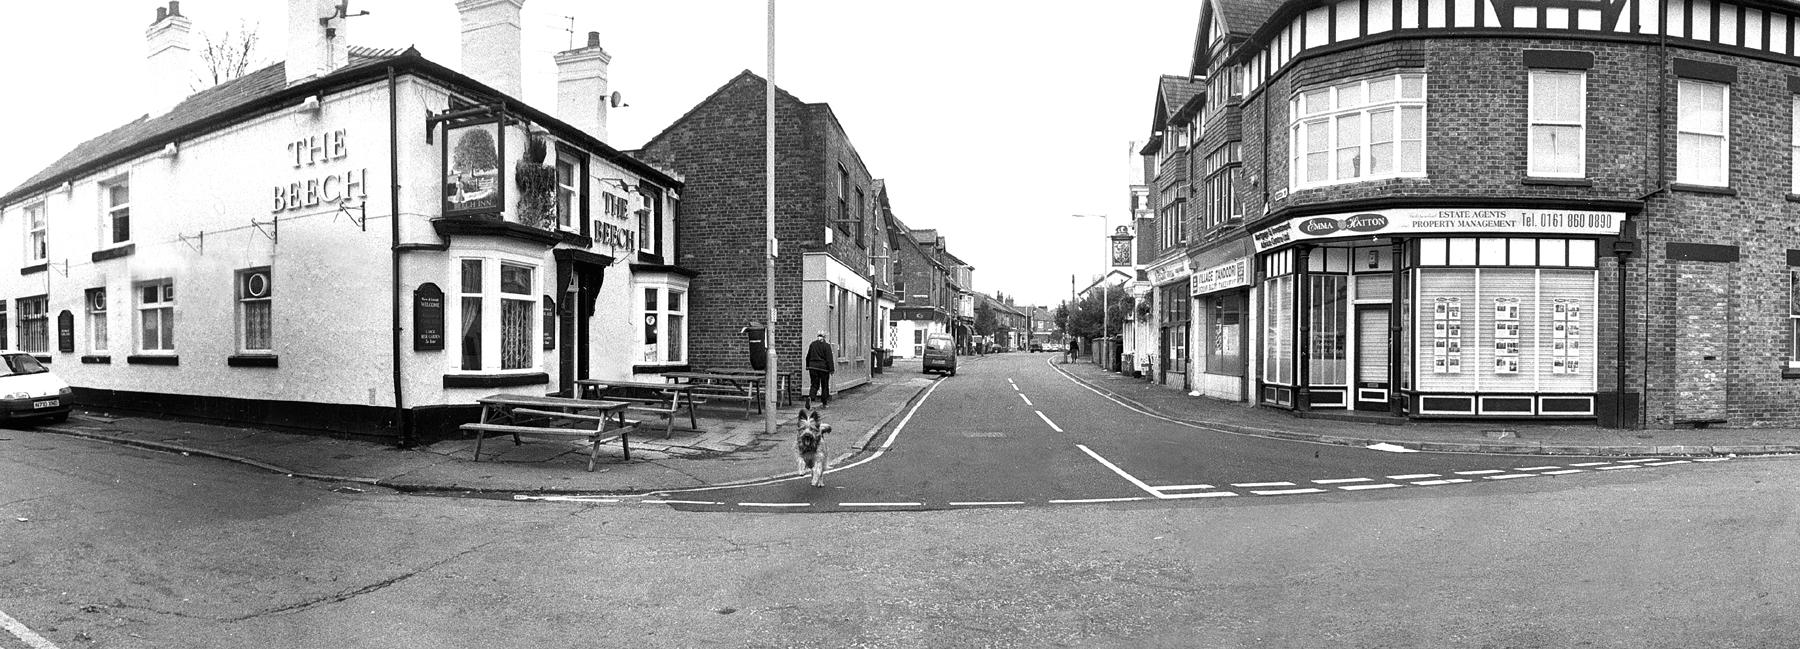 Beech road Chorlton